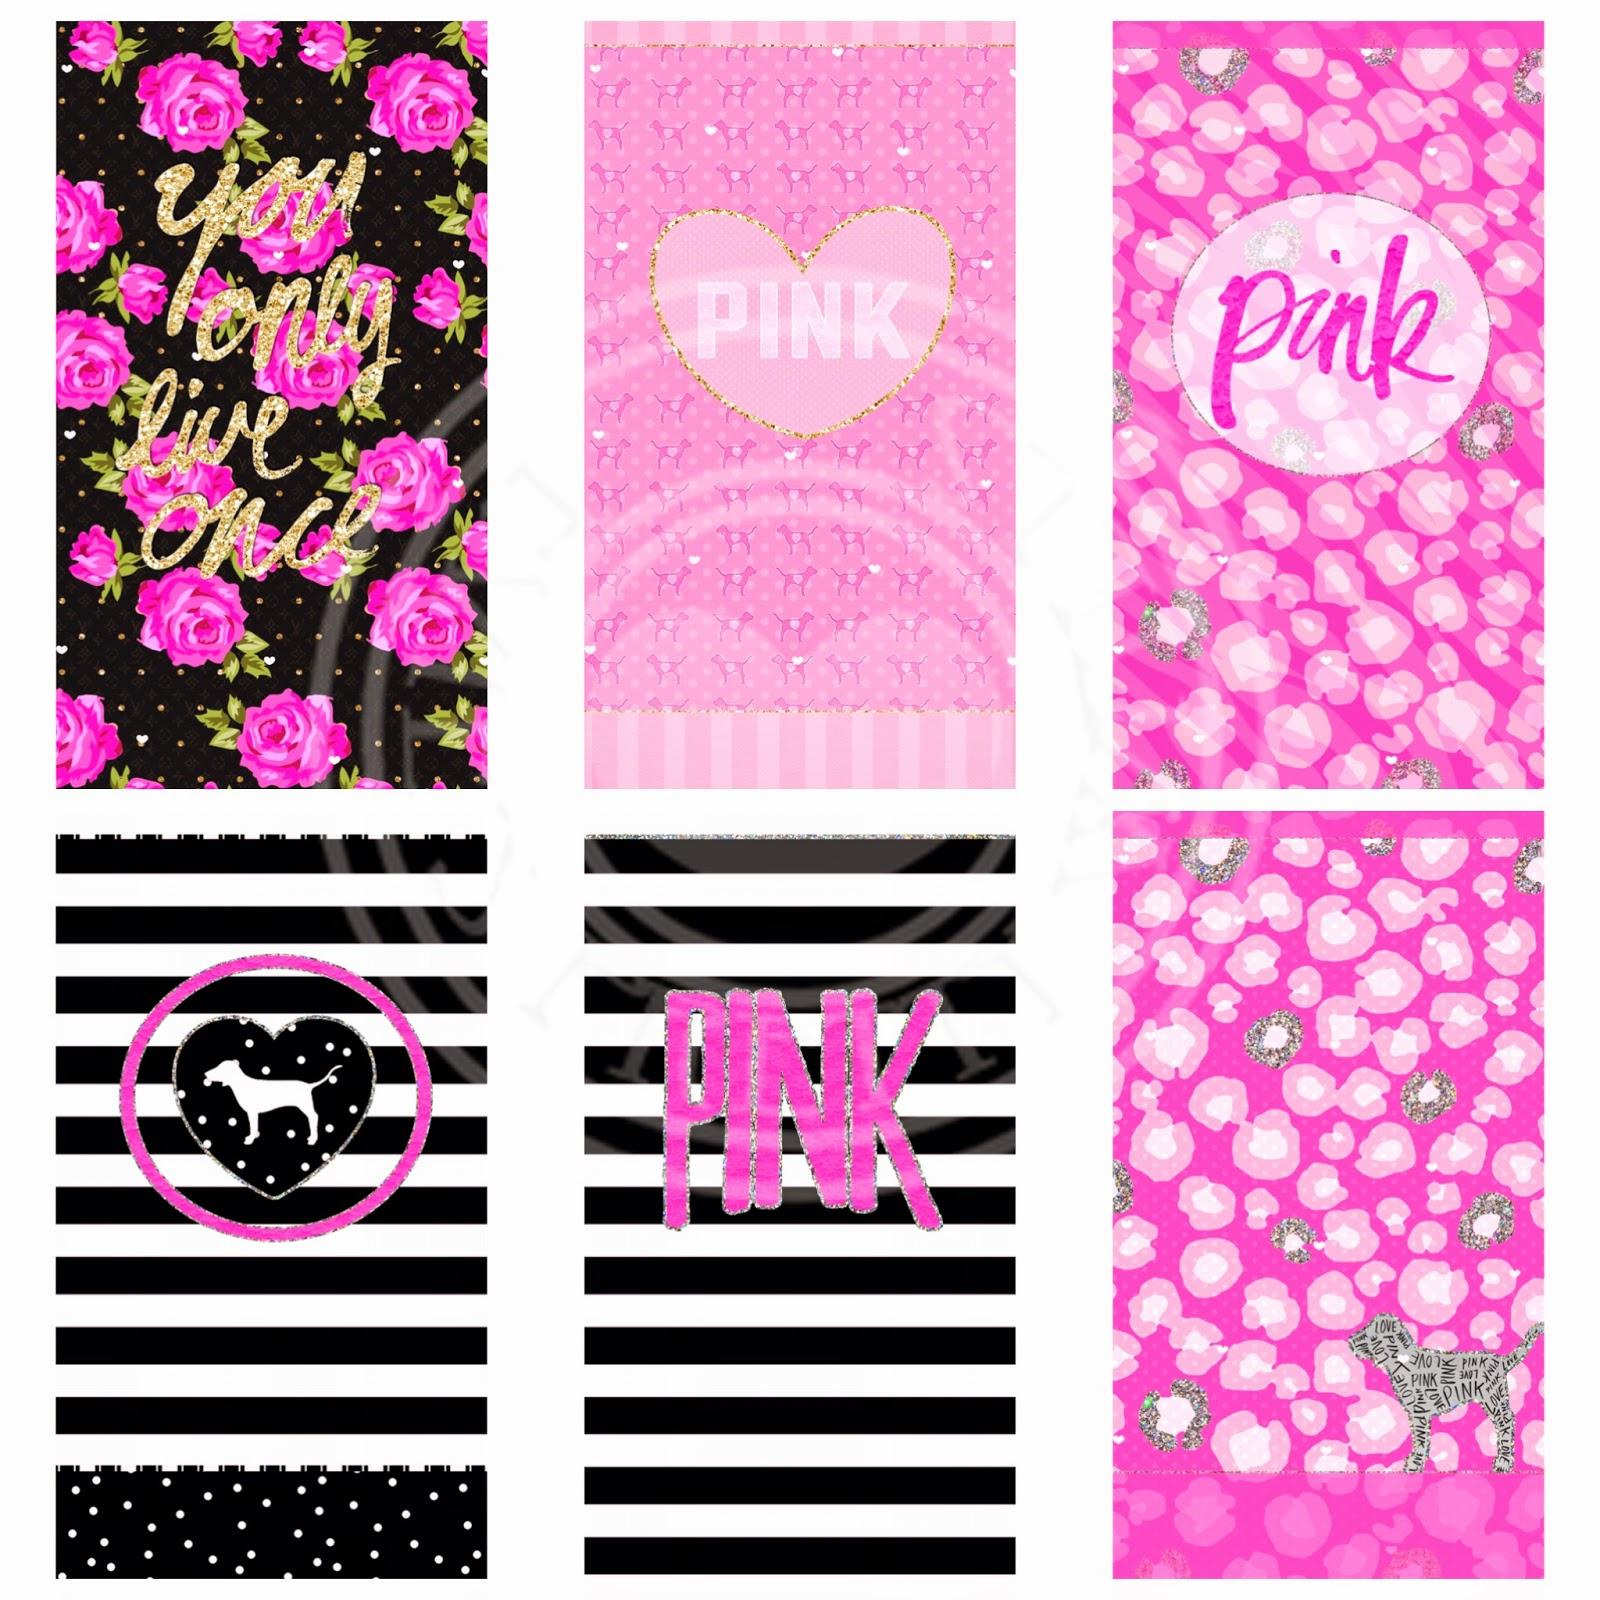 pink nation wallpaper  Pretty Walls: PINK NATION 15 PIECE WALLPAPER SET